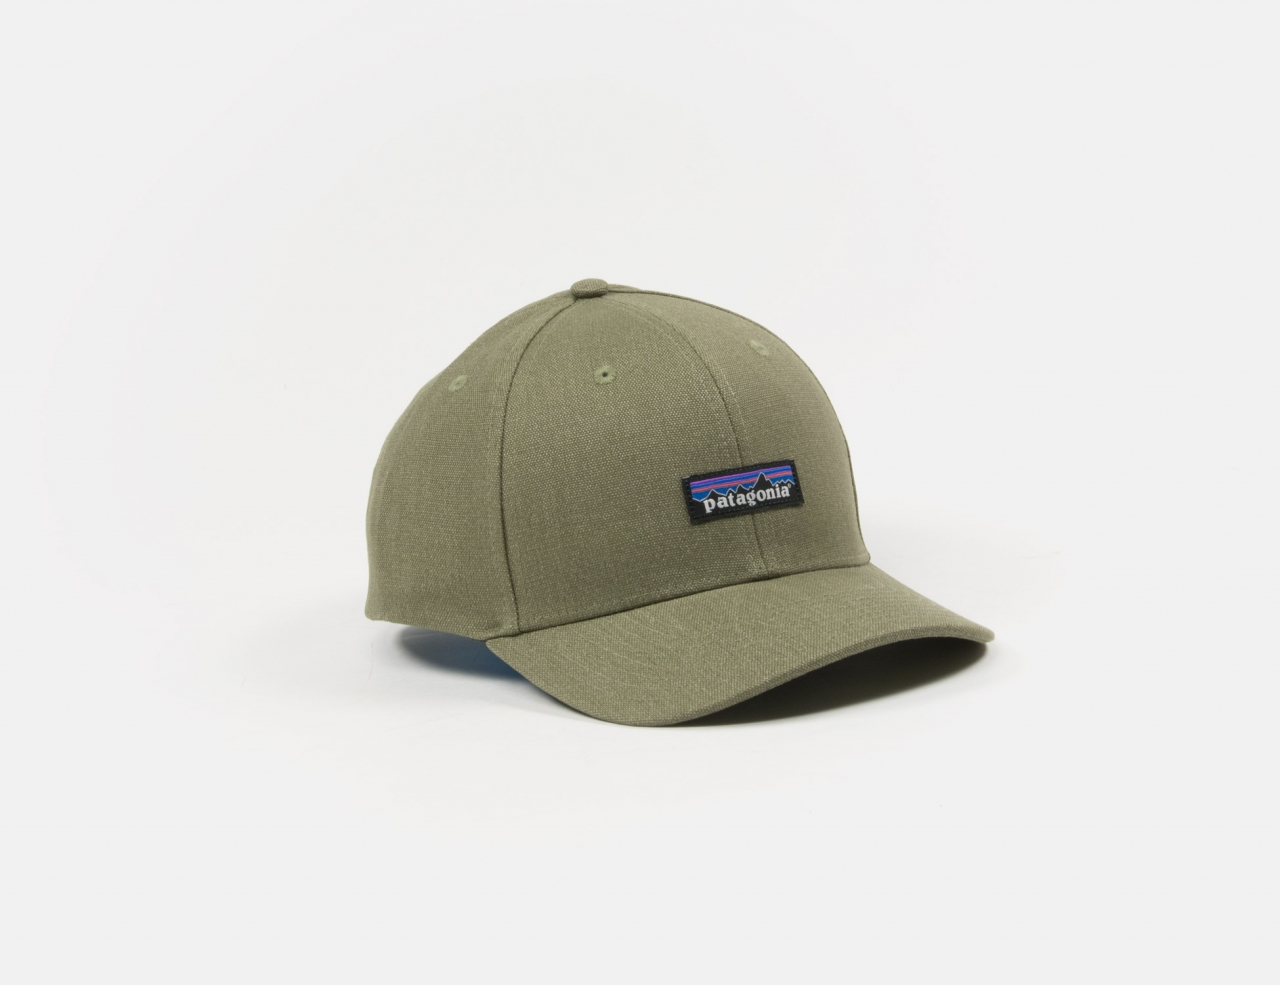 Patagonia Tin Shed Cap - Fatigue Green